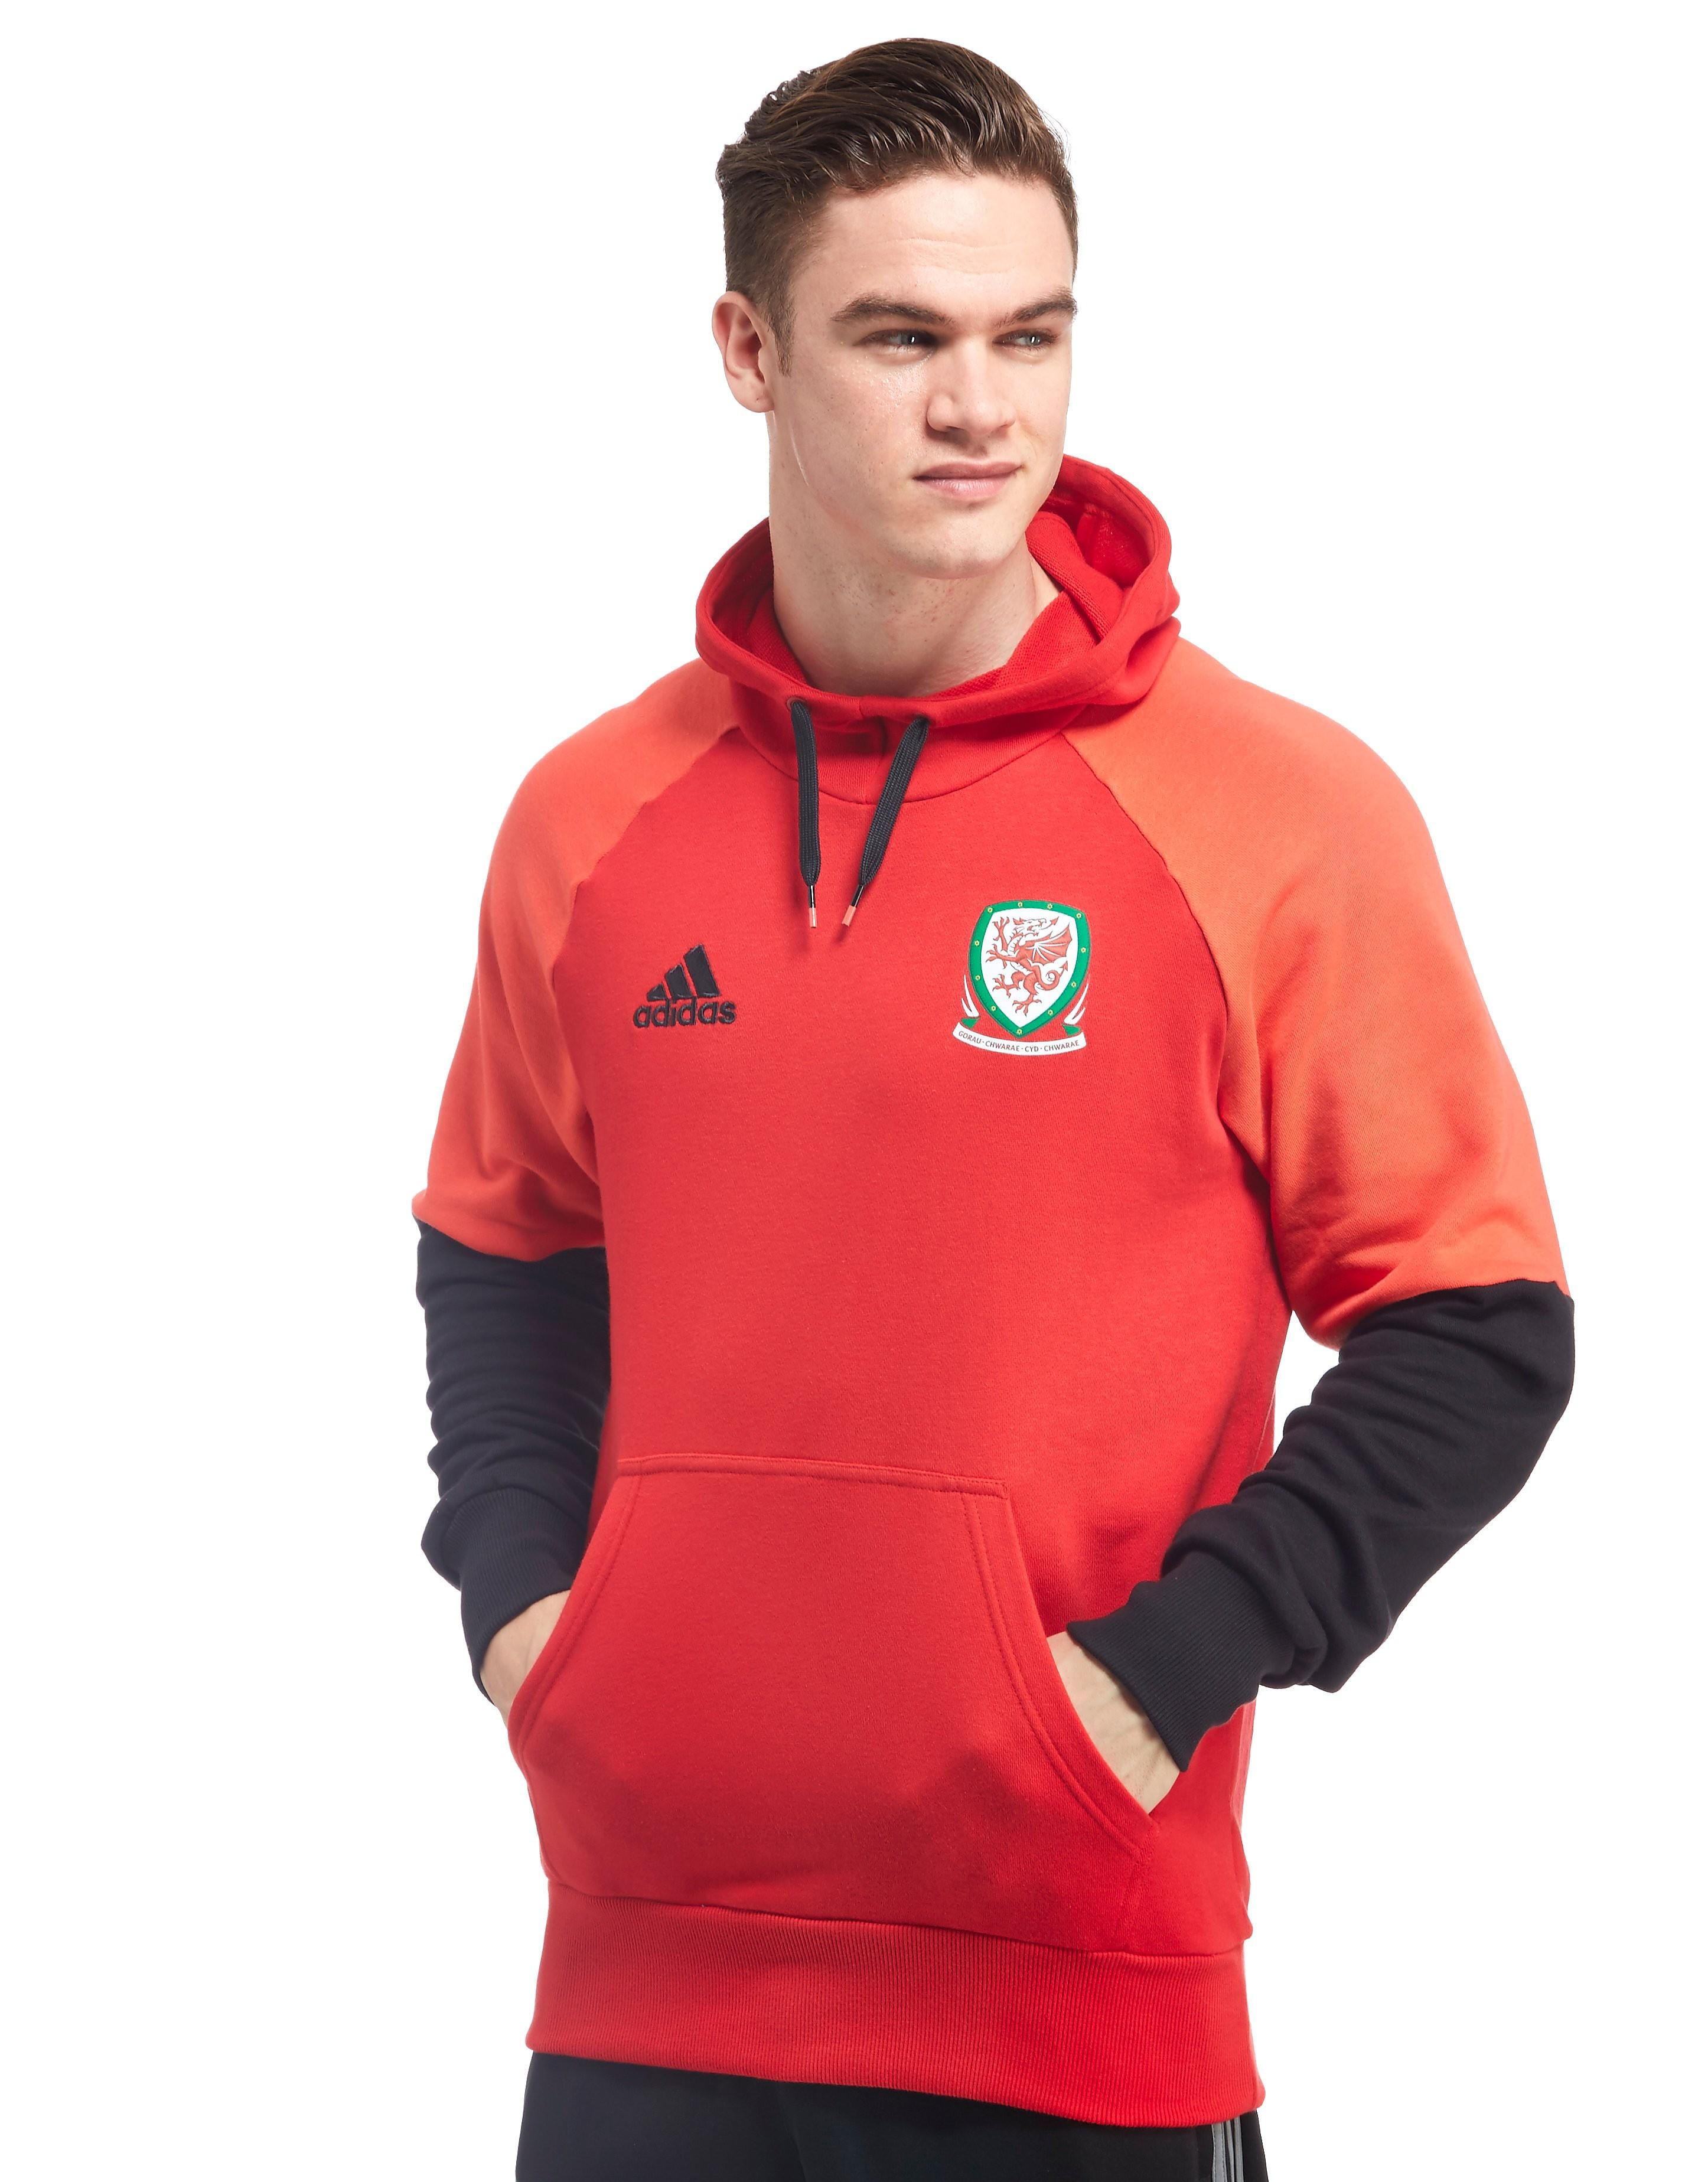 adidas Wales 2016/17 Hoody